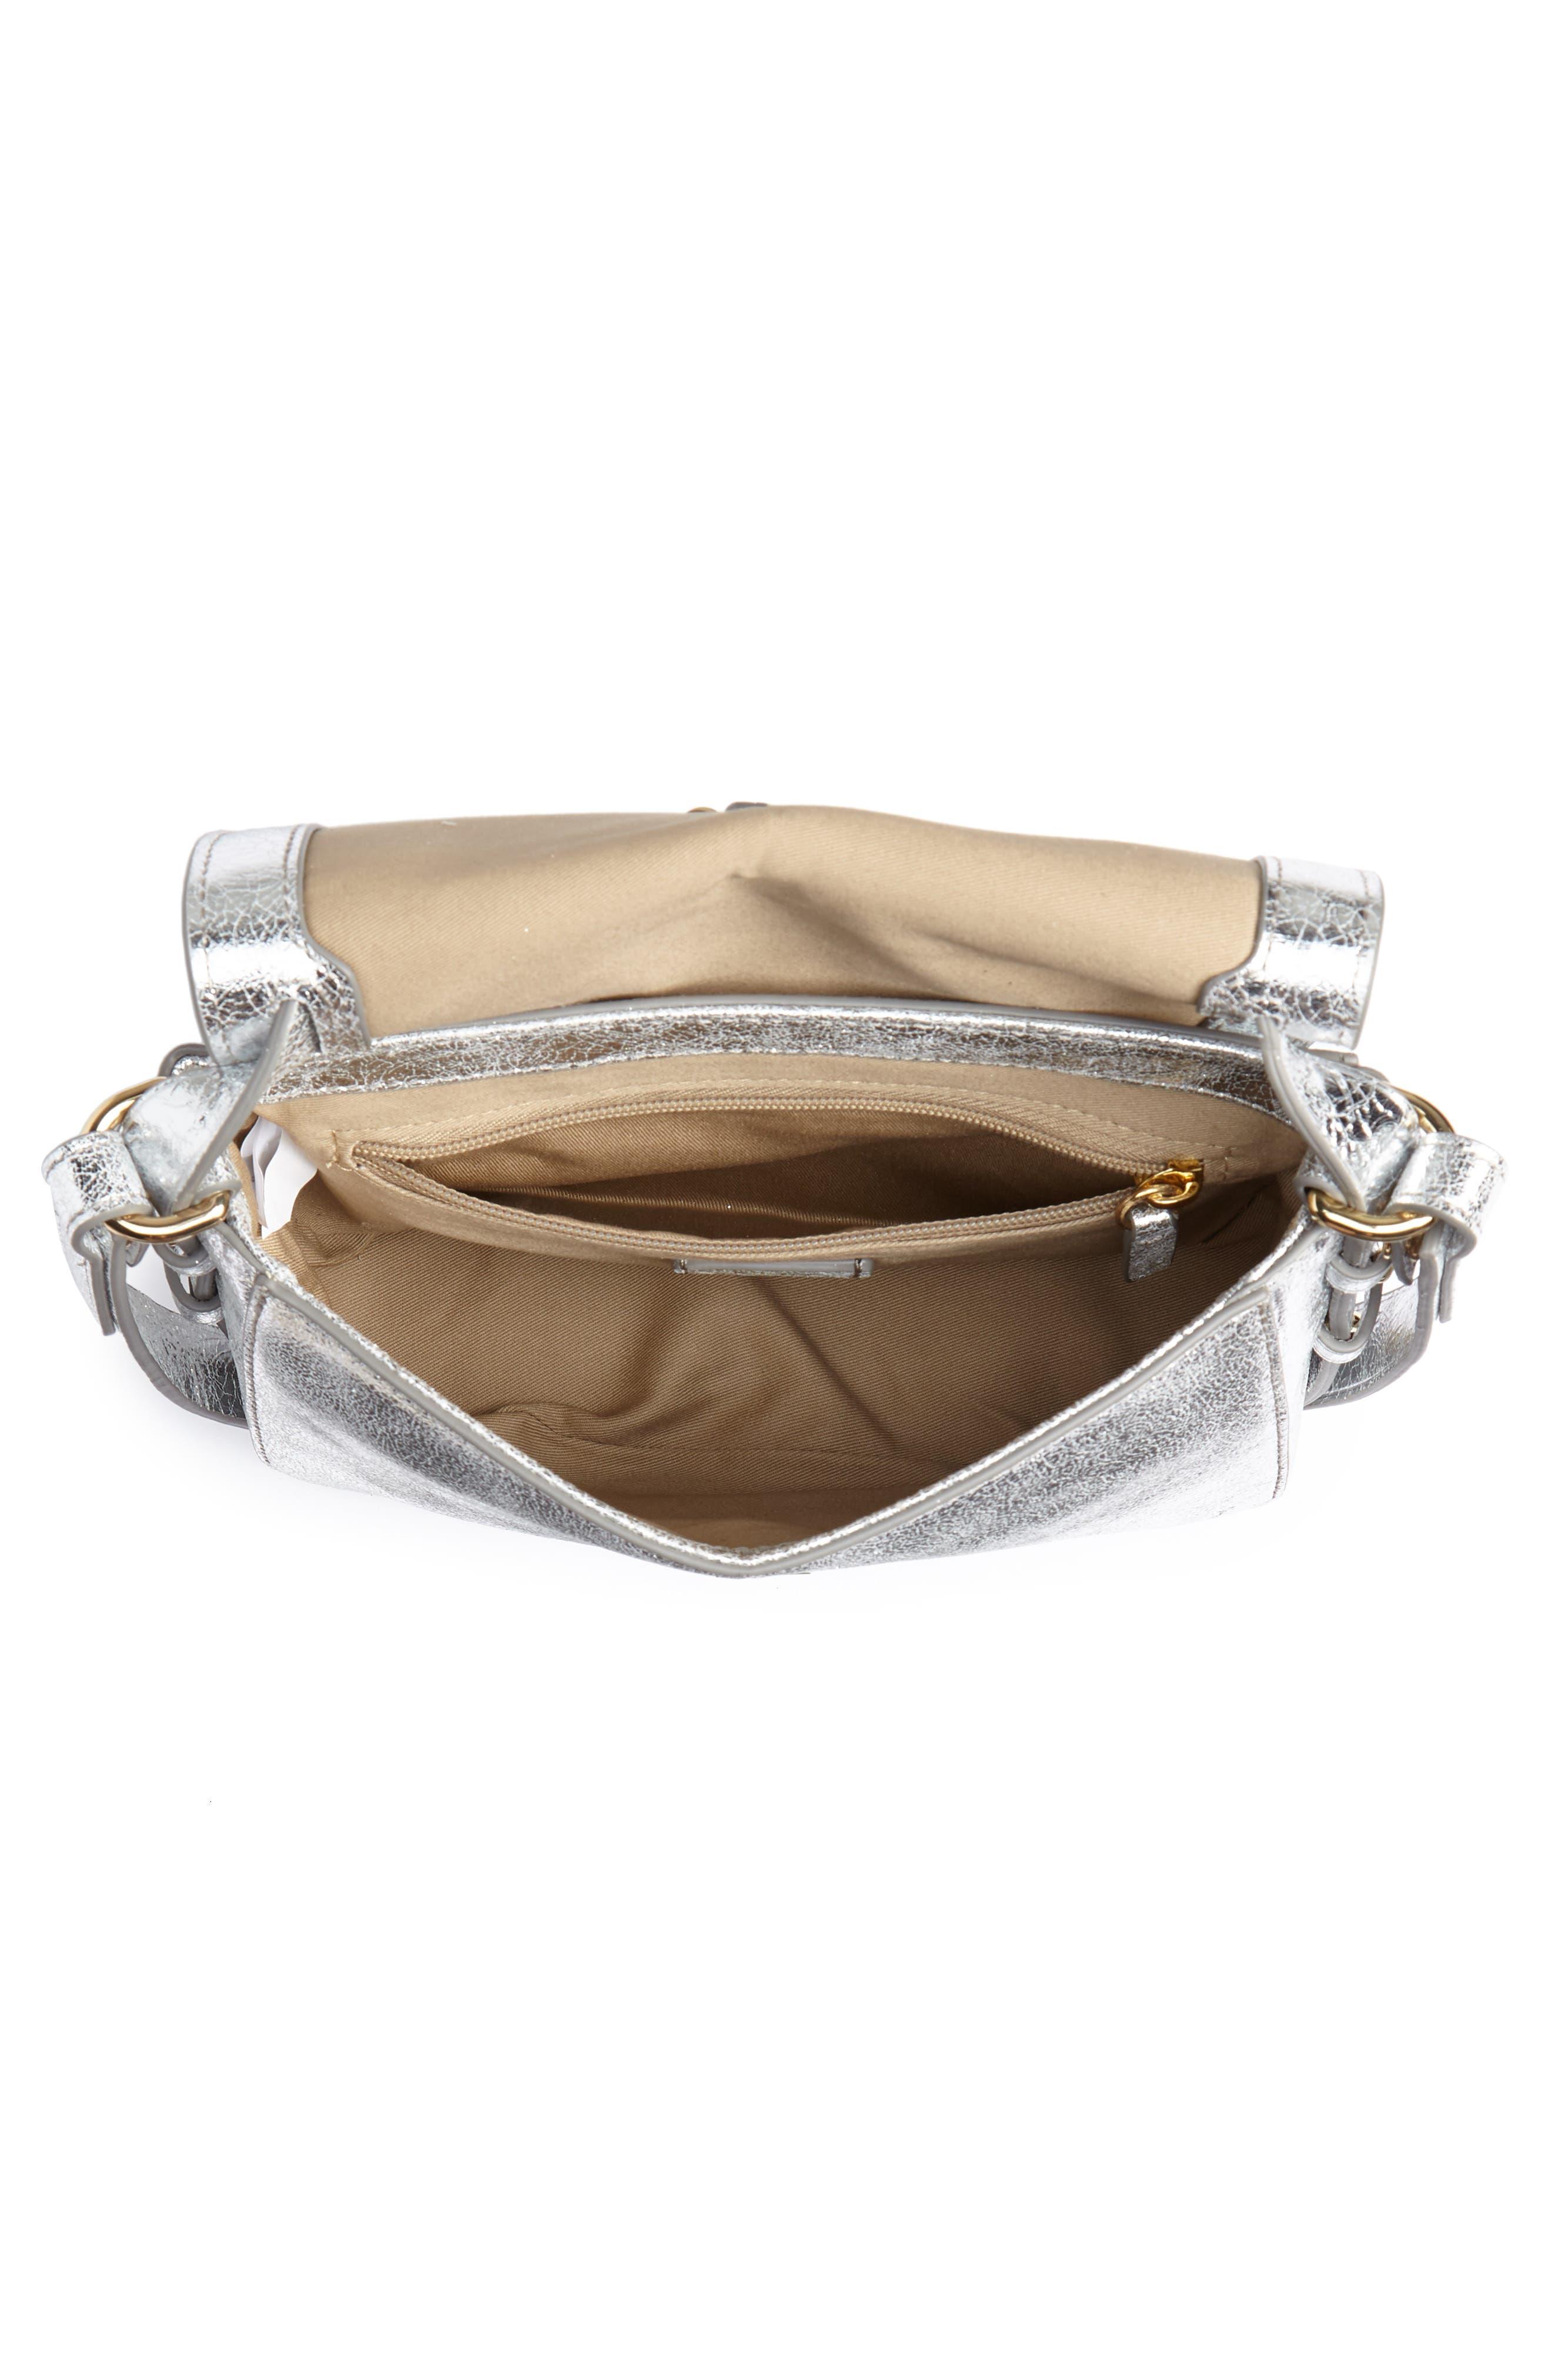 Harper Metallic Leather Crossbody Bag,                             Alternate thumbnail 4, color,                             METALLIC SILVER